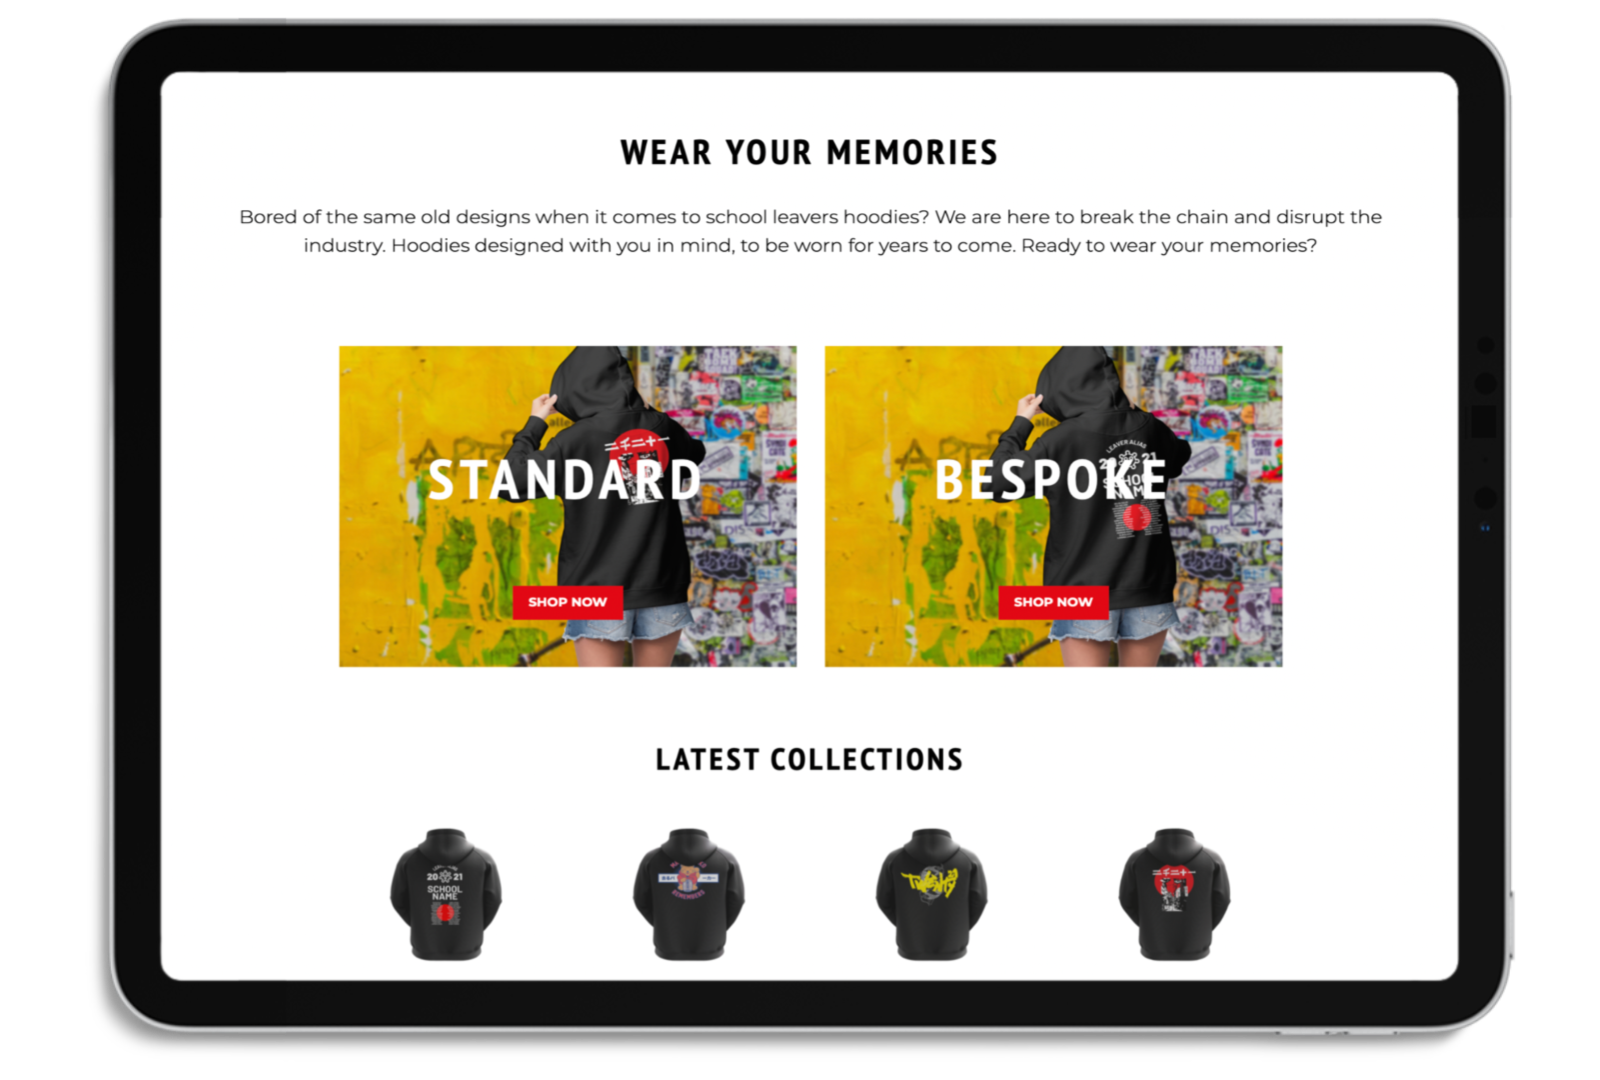 iPad mockup with a sample of the sarupaka website